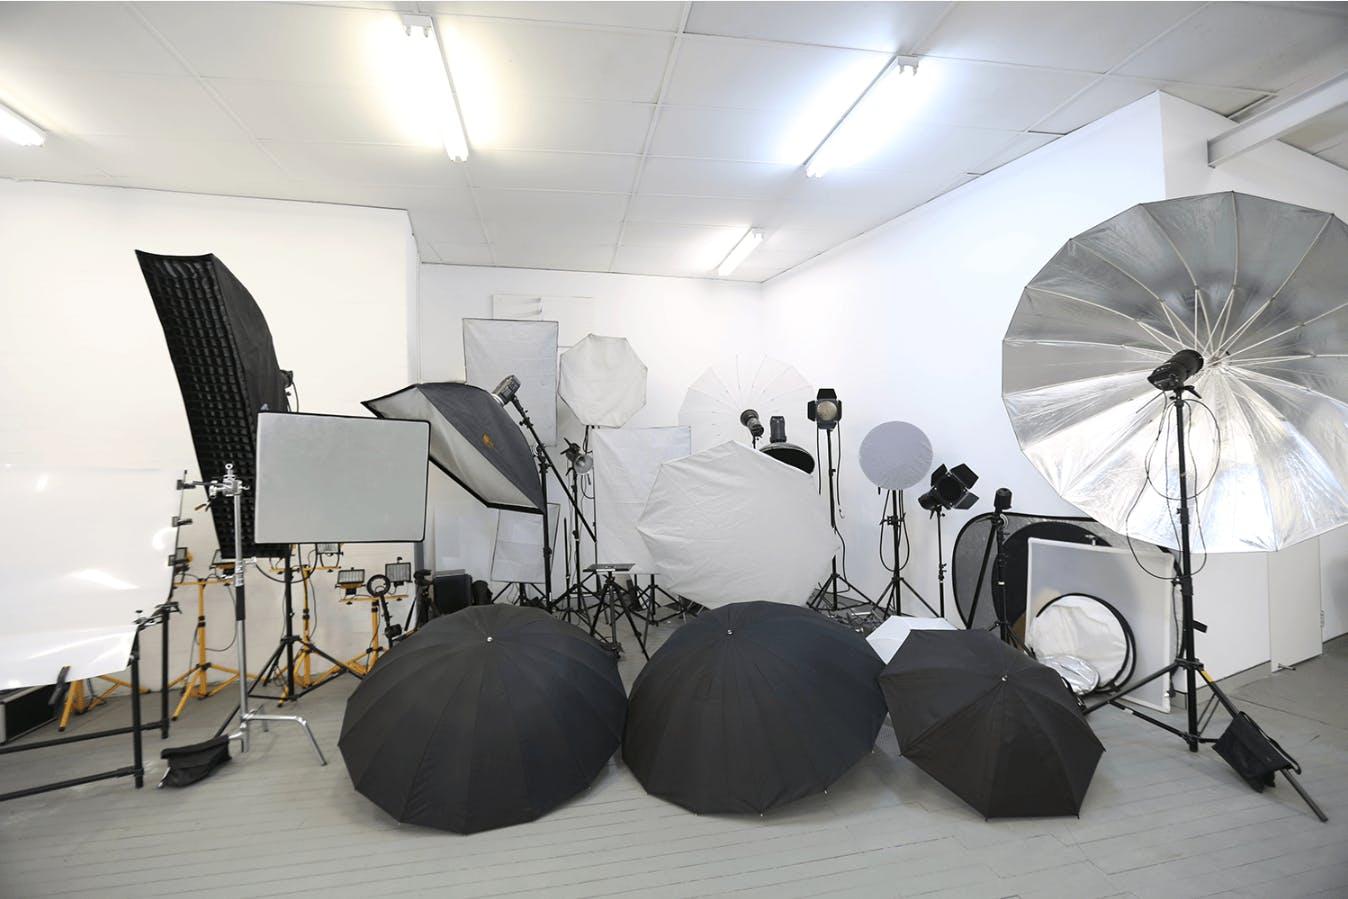 Photography Studio, creative studio at Luky Studio, image 1